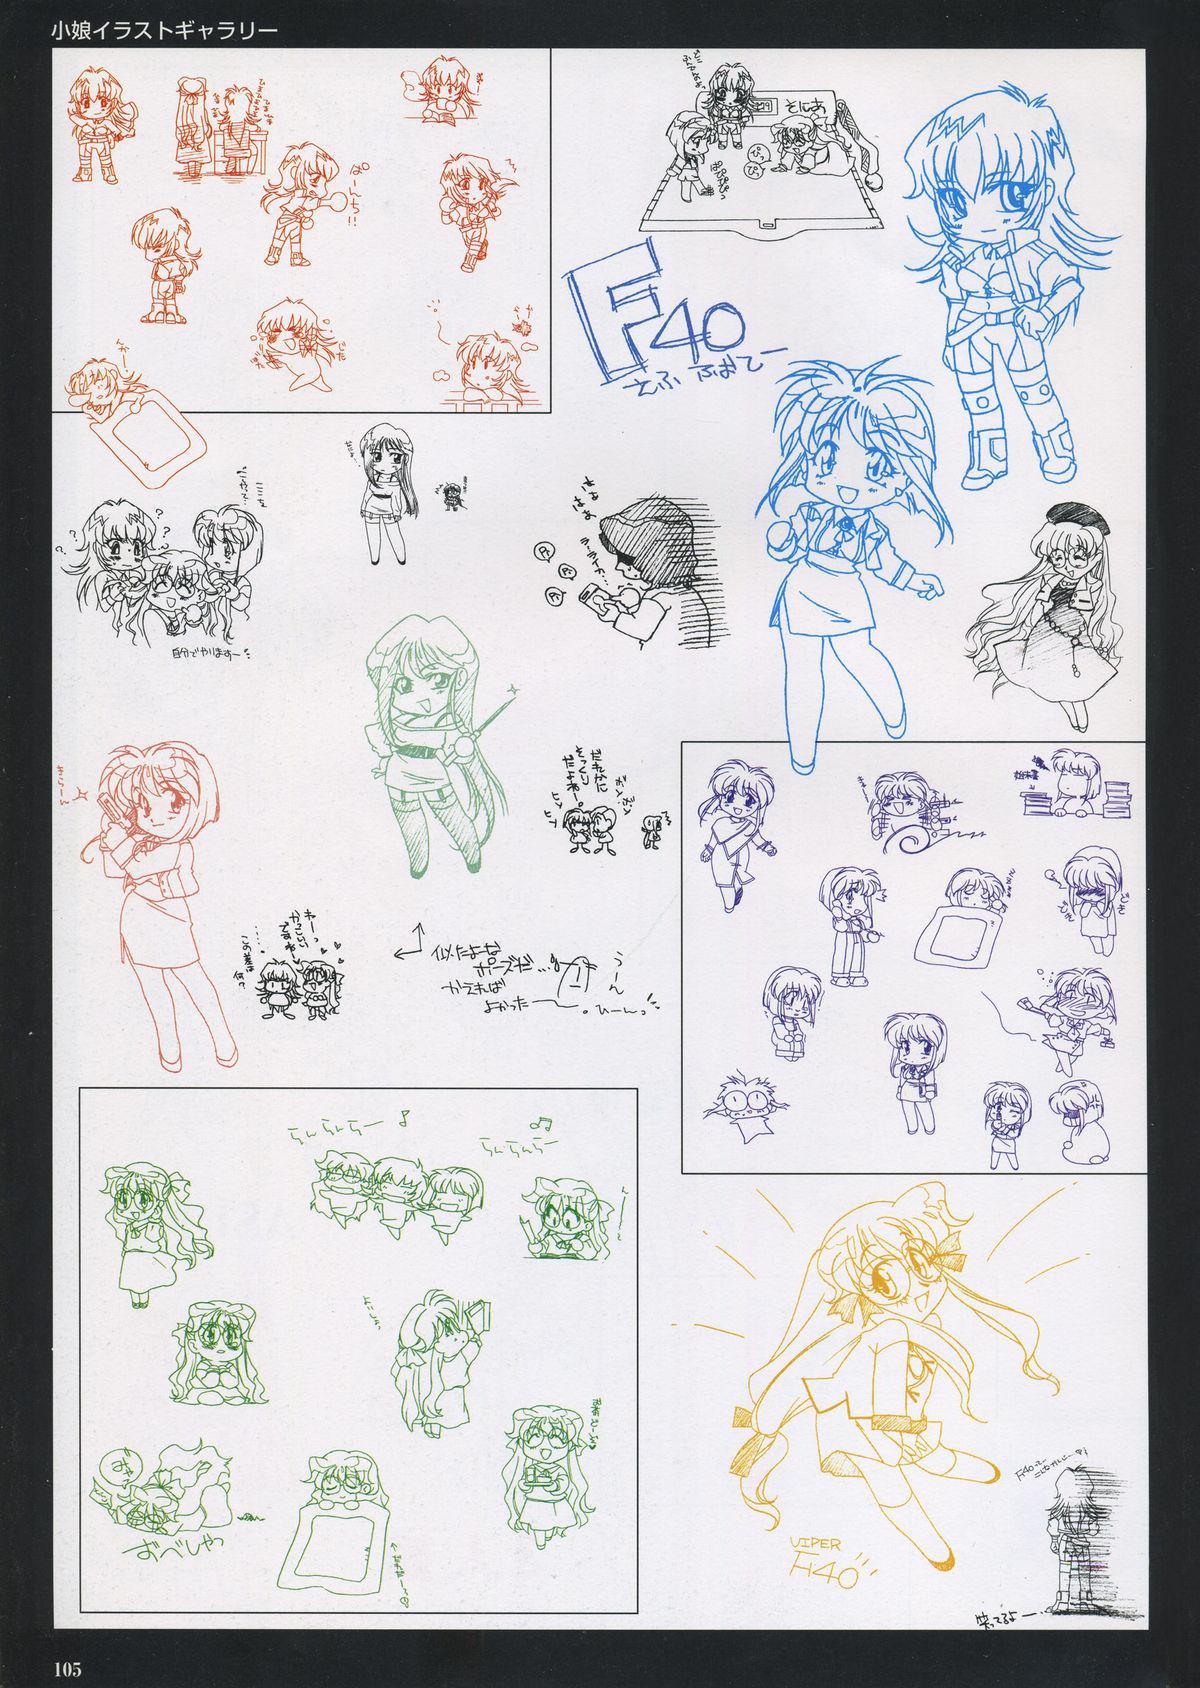 VIPER Series Official Artbook III 107